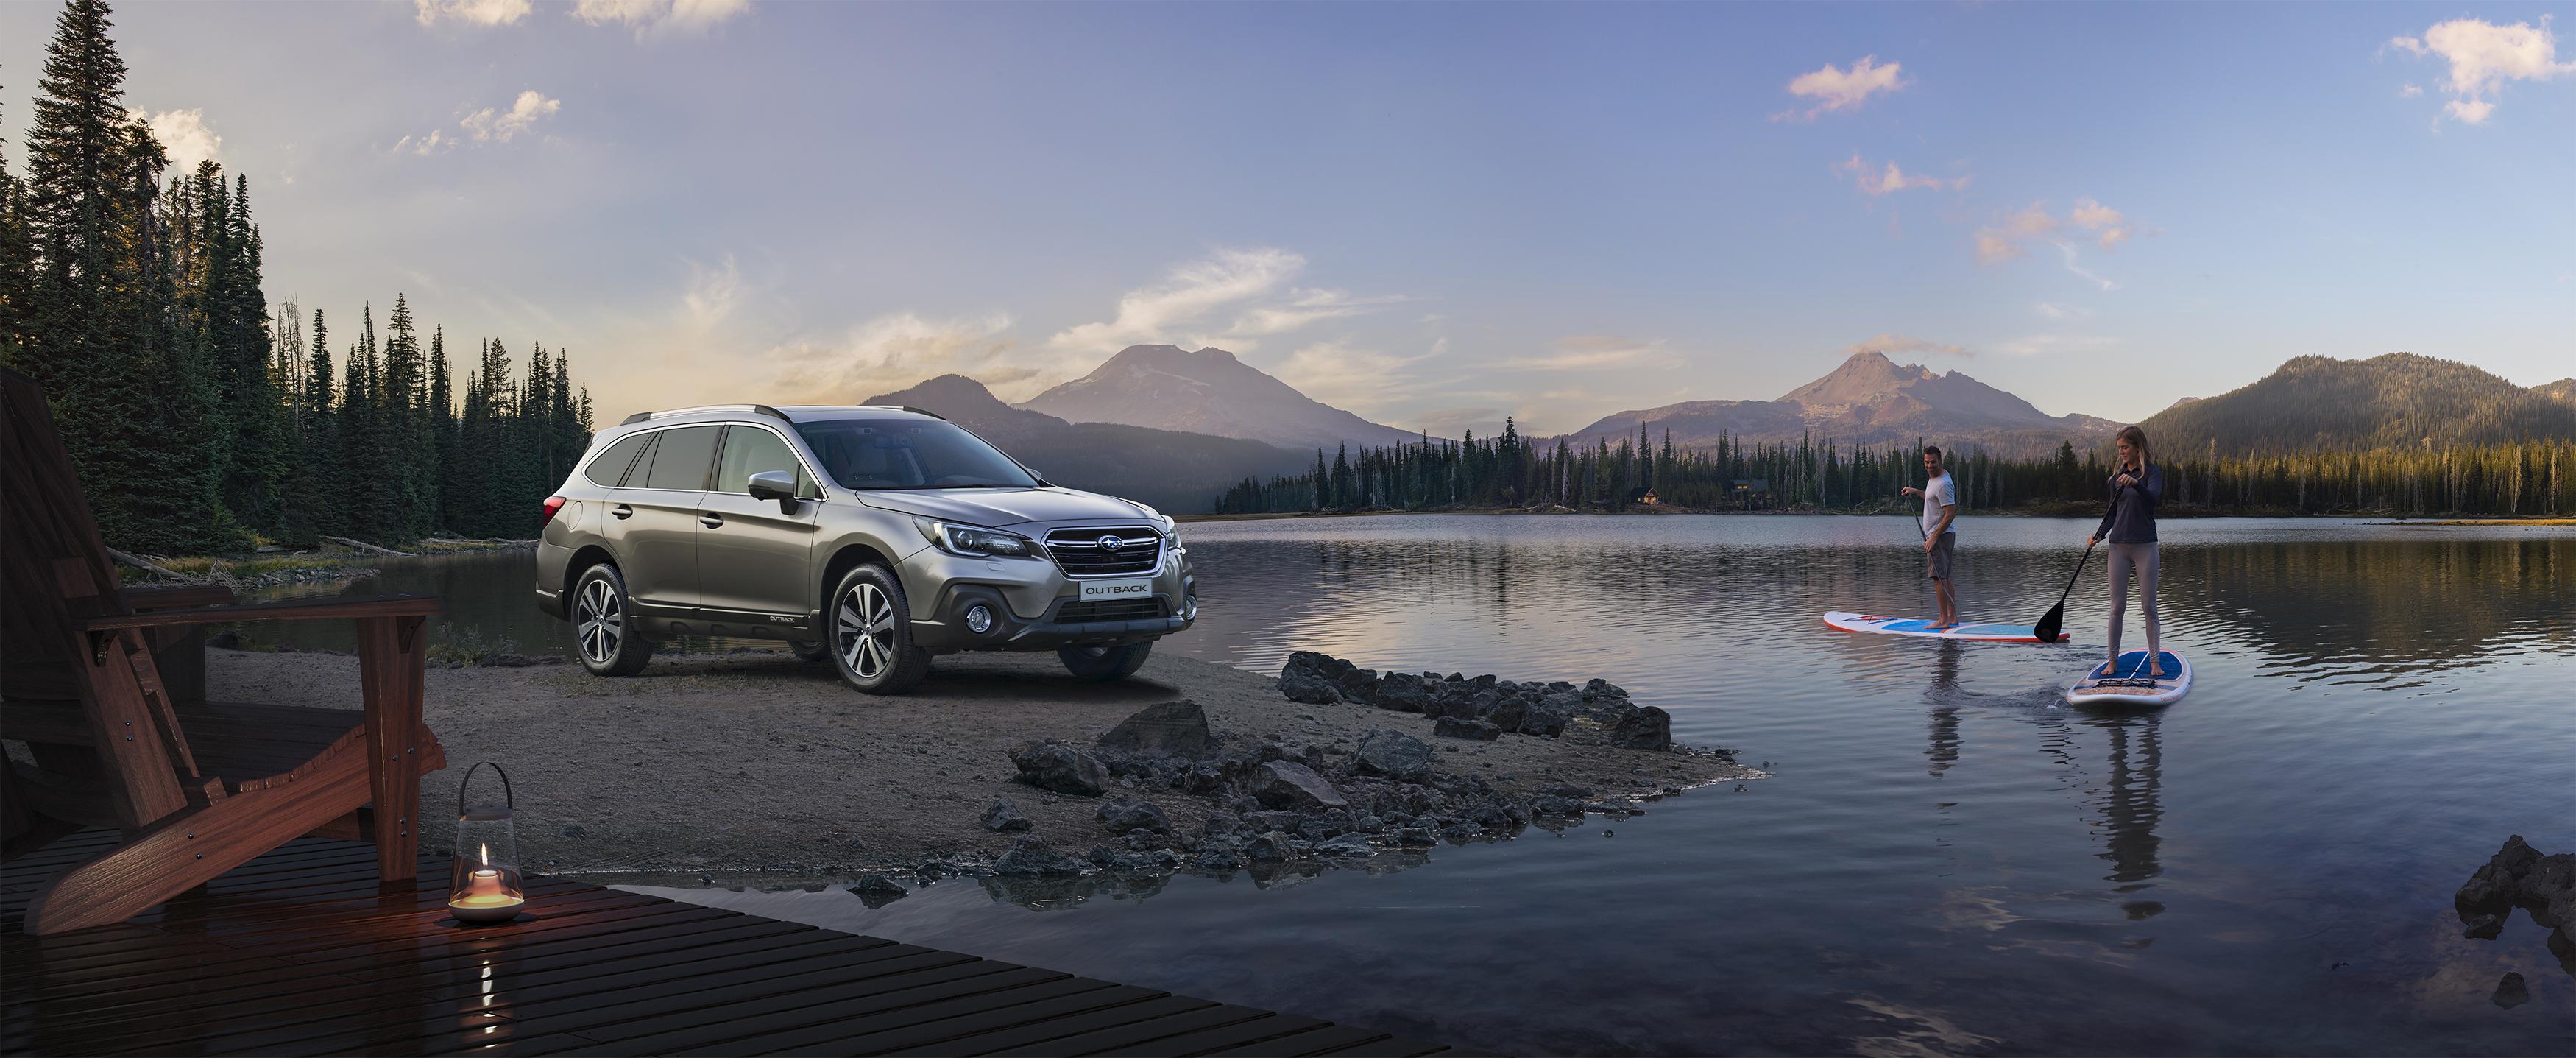 KAMPANJ! Privatleasing Subaru Outback